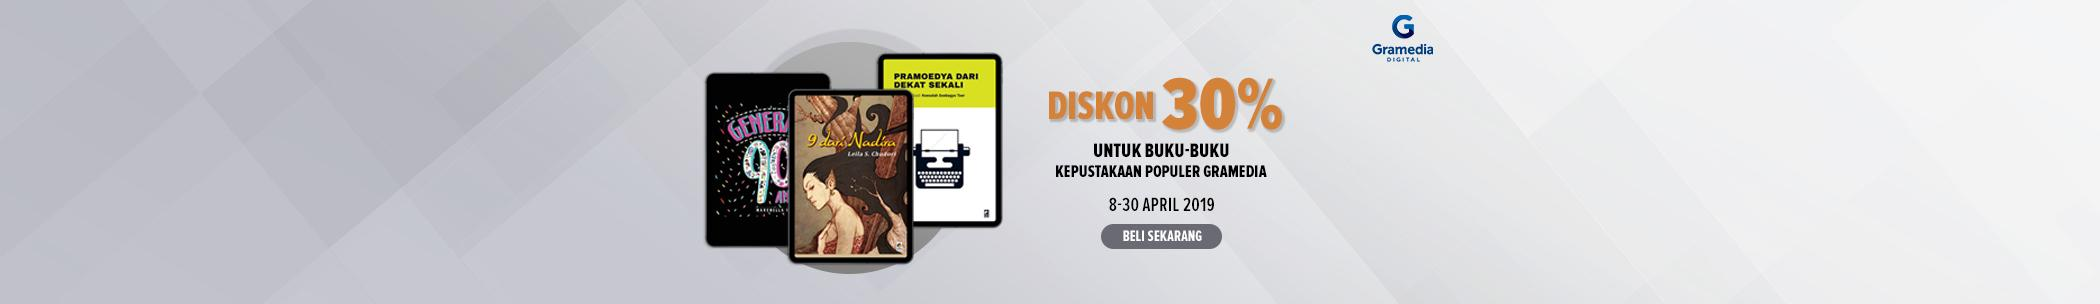 Diskon internal publisher - Kepustakaan Populer Gramedia